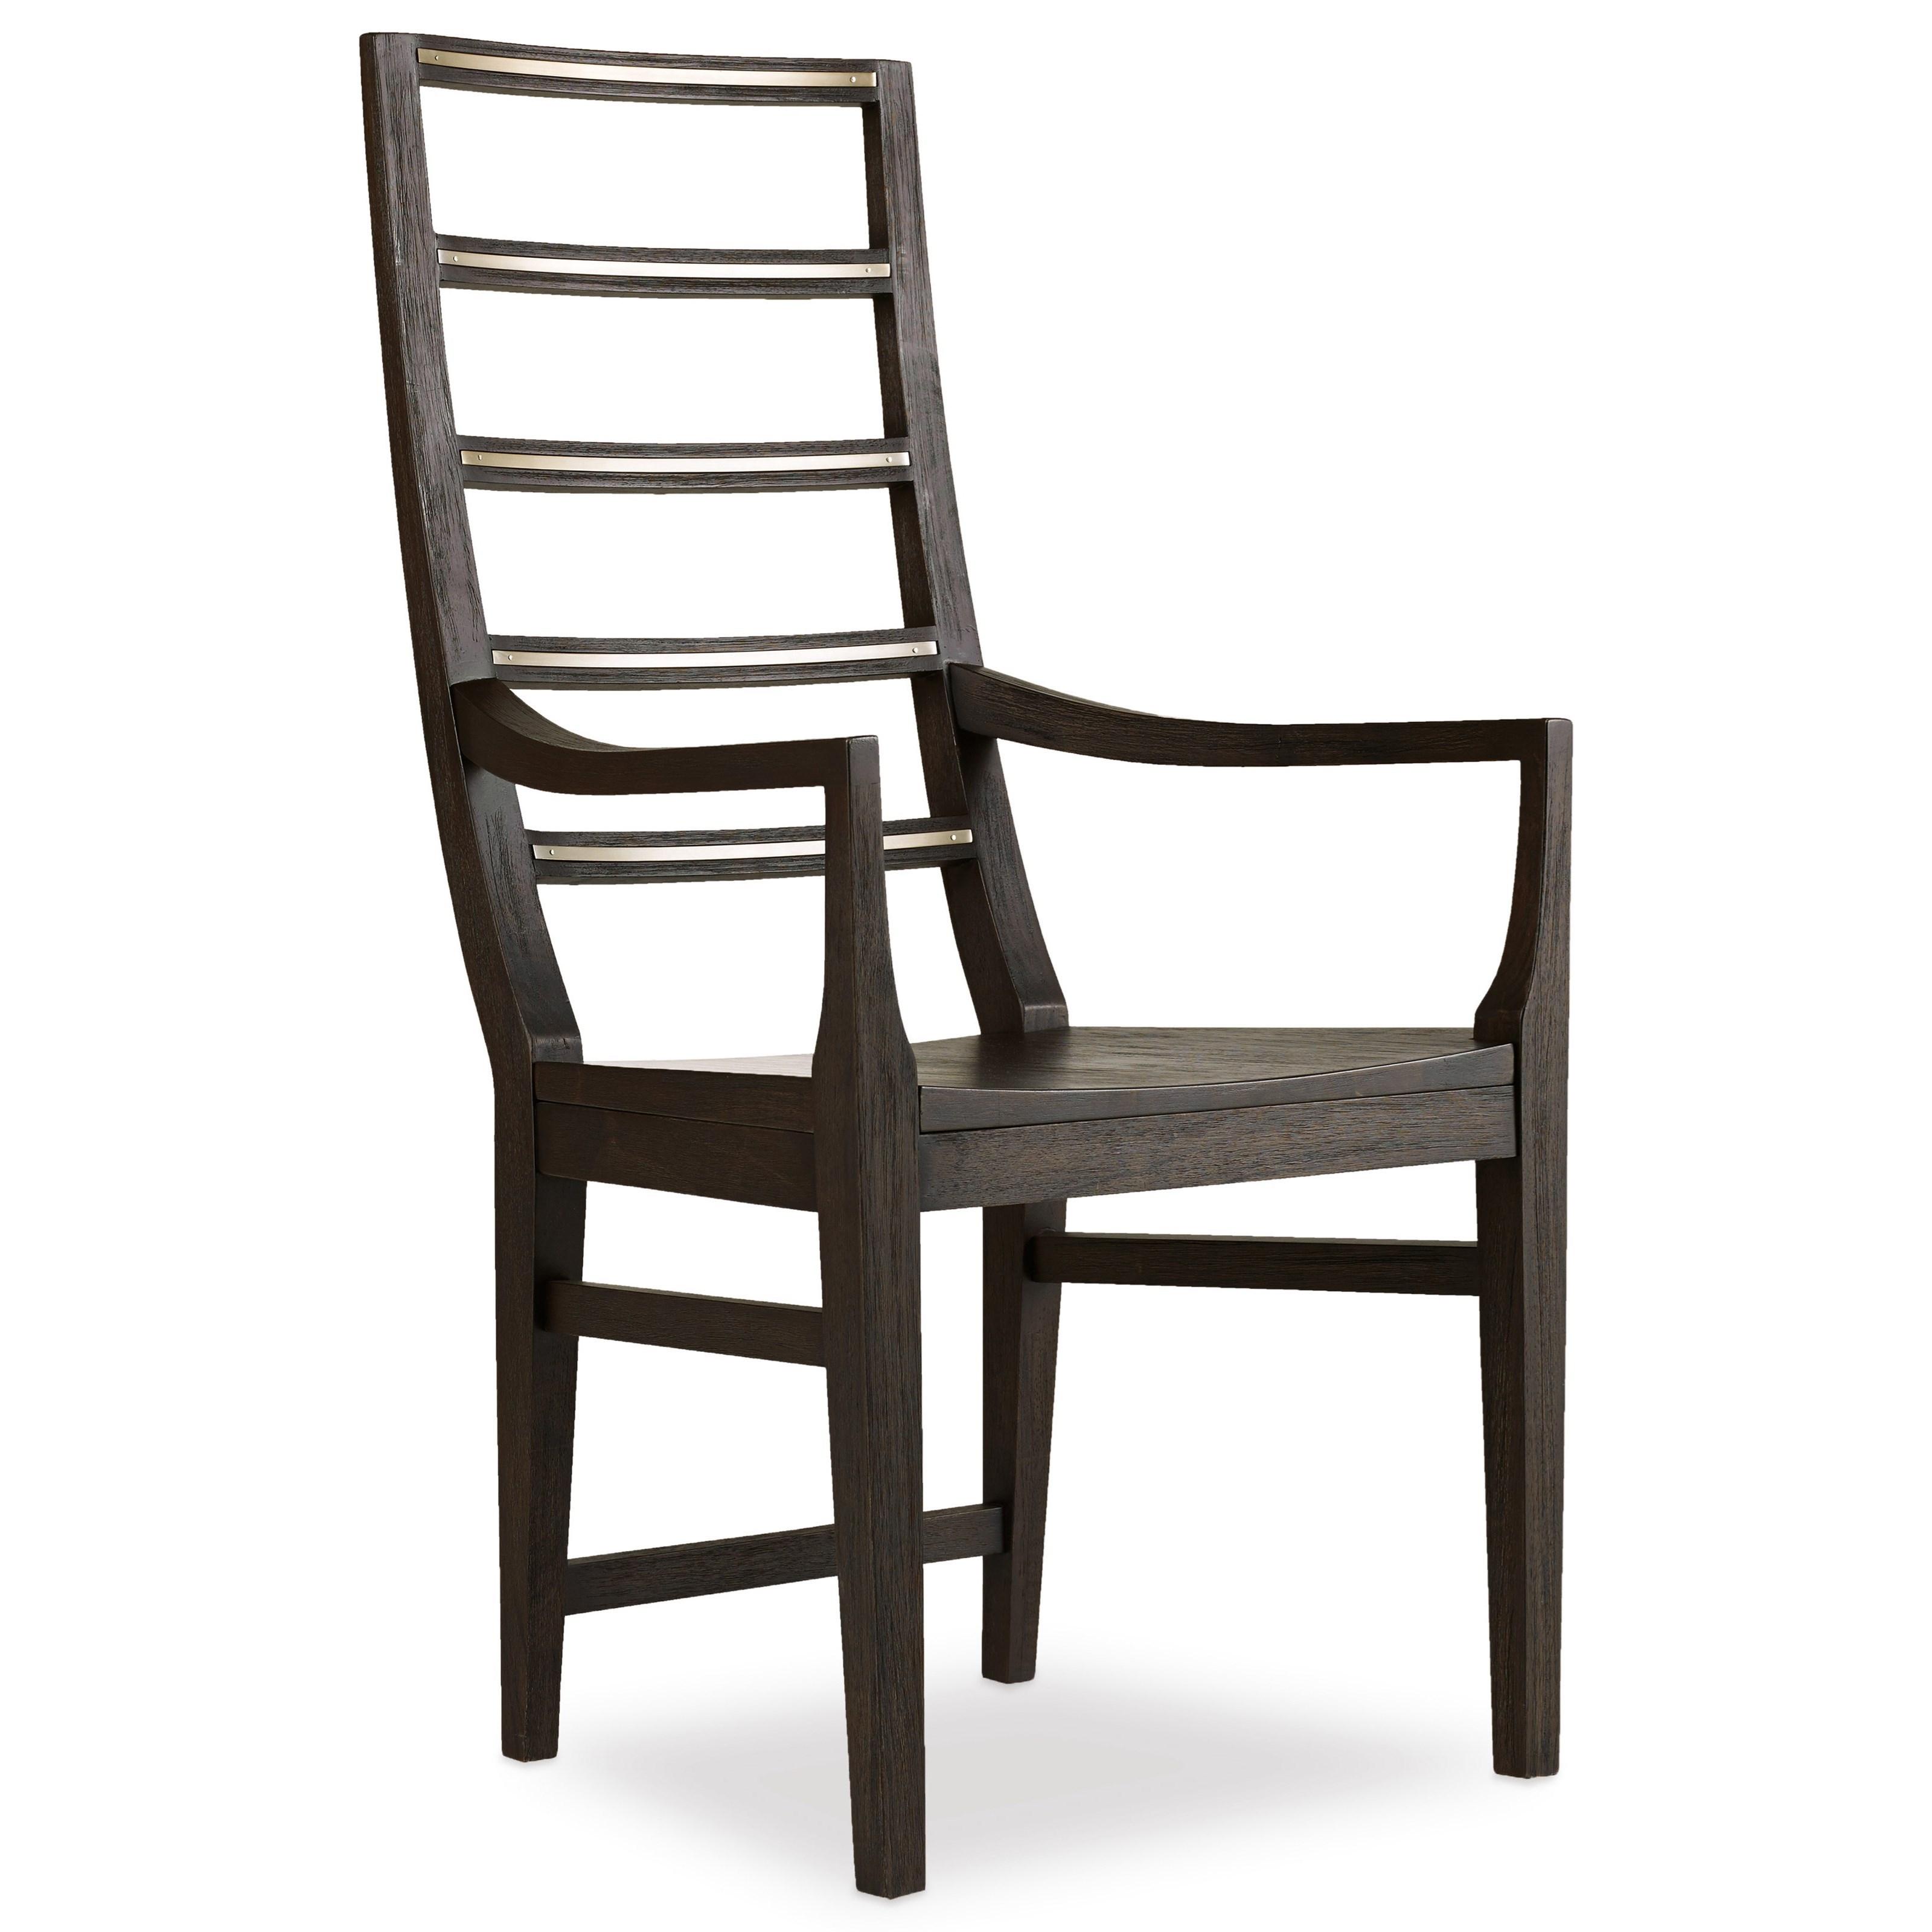 Hooker Furniture Curata 1600 75300 Dkw Ladderback Arm